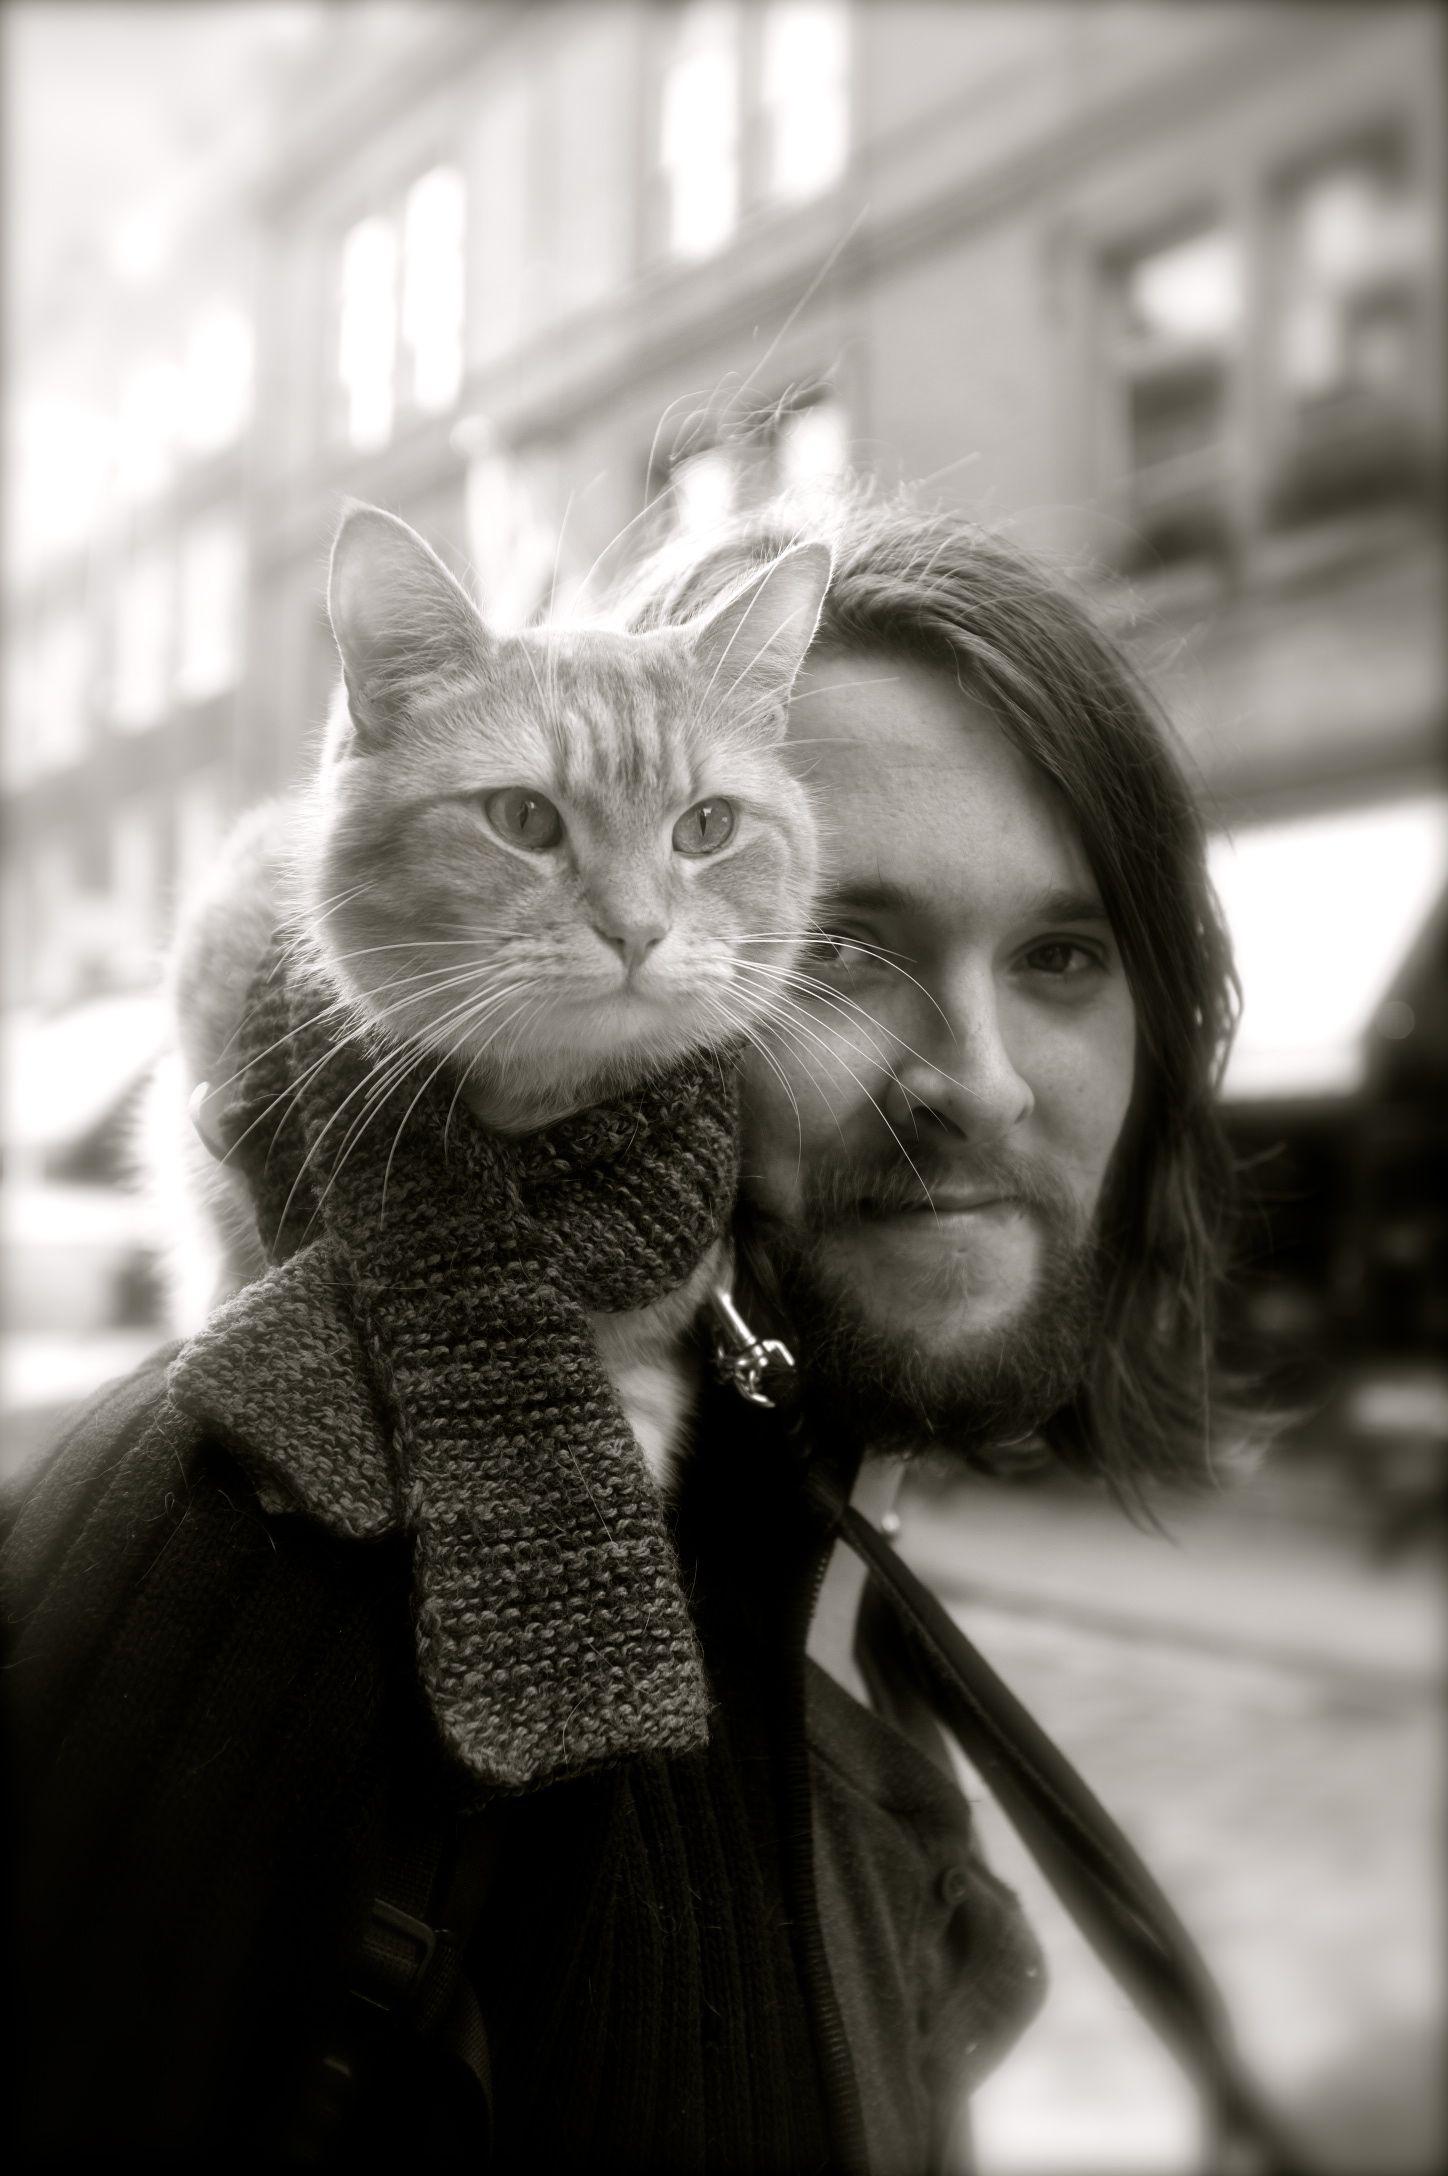 Bob the cat. Cat Named Bob with his human James Bowen